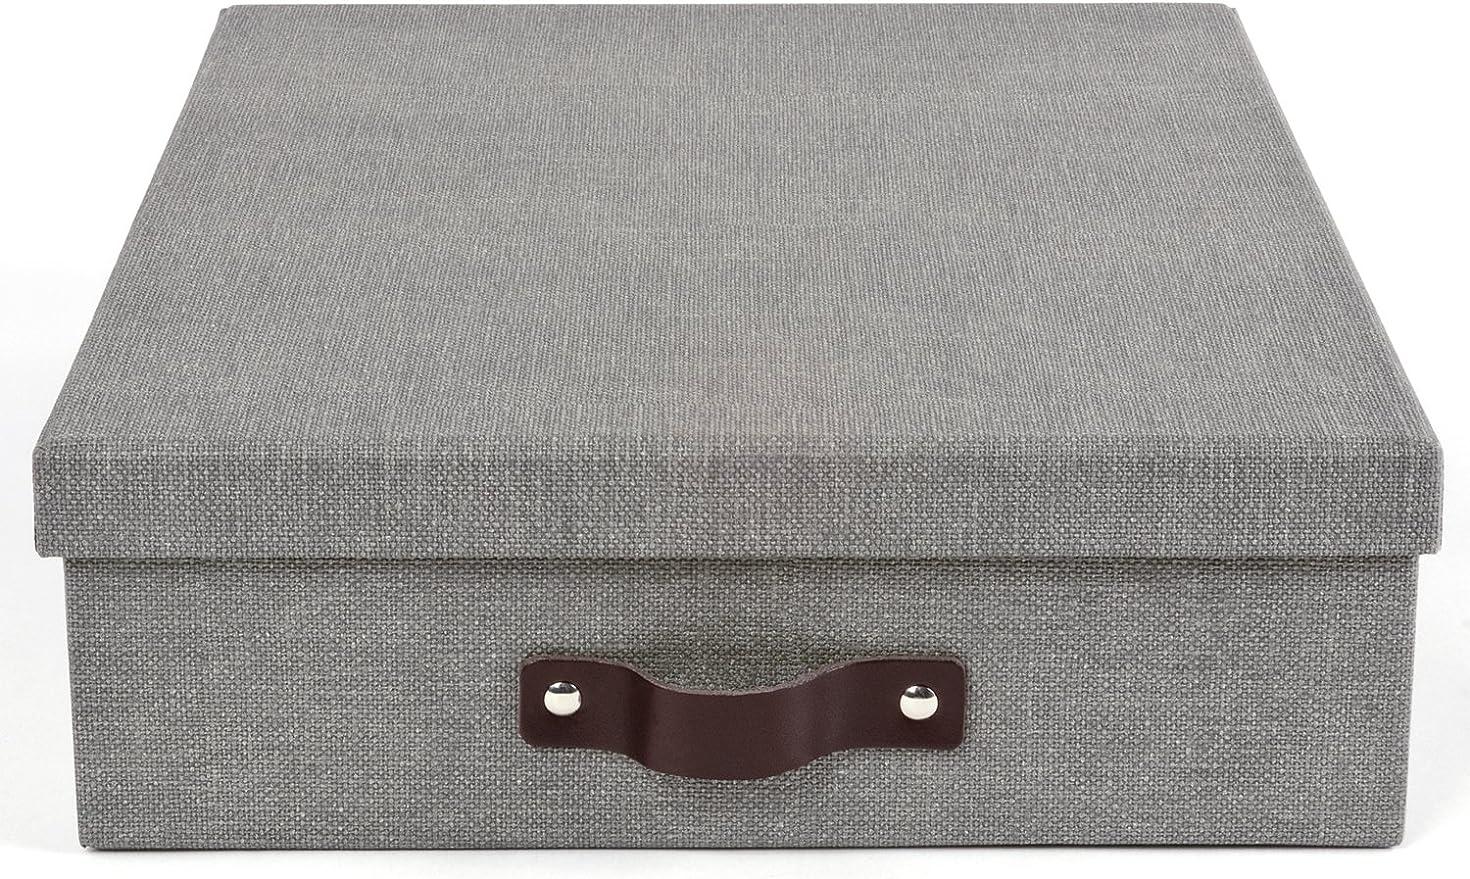 The Holding Company A4 de Oskar – Caja para Cartas, 26 x 35 x 9 cm (B X T x h) Gris: Amazon.es: Hogar